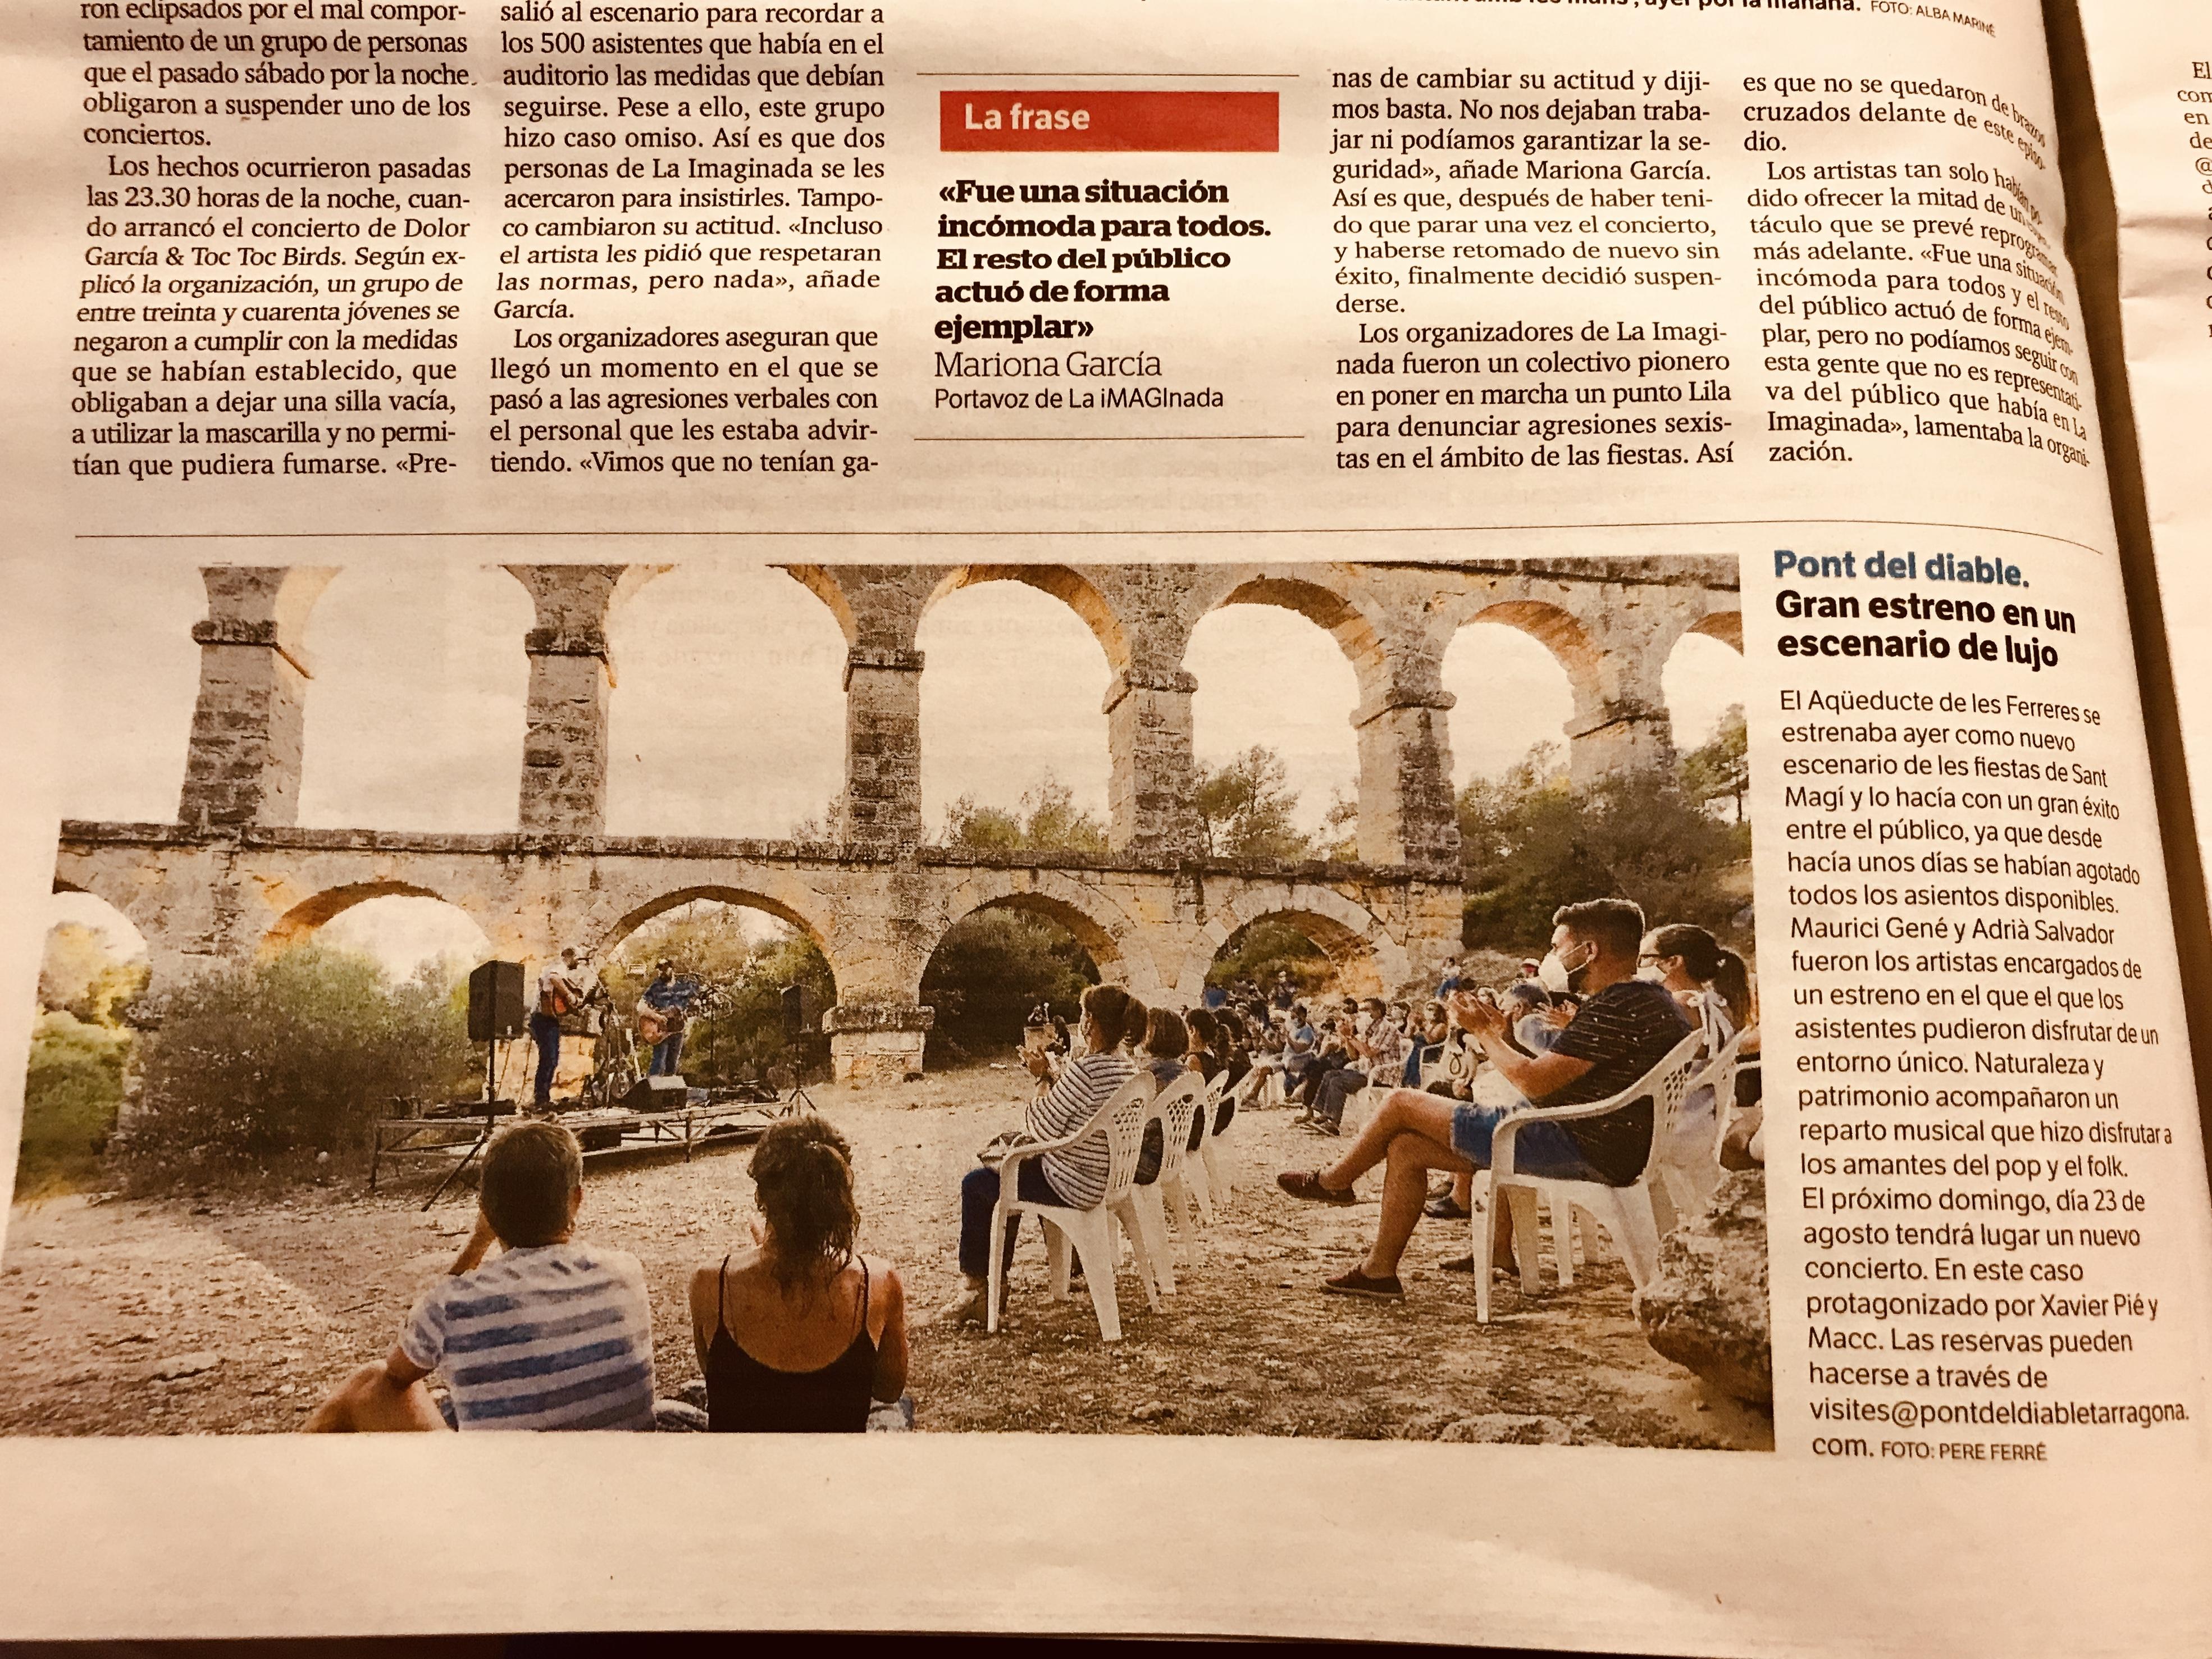 GERARD MARTÍ FOTOGRAFIA